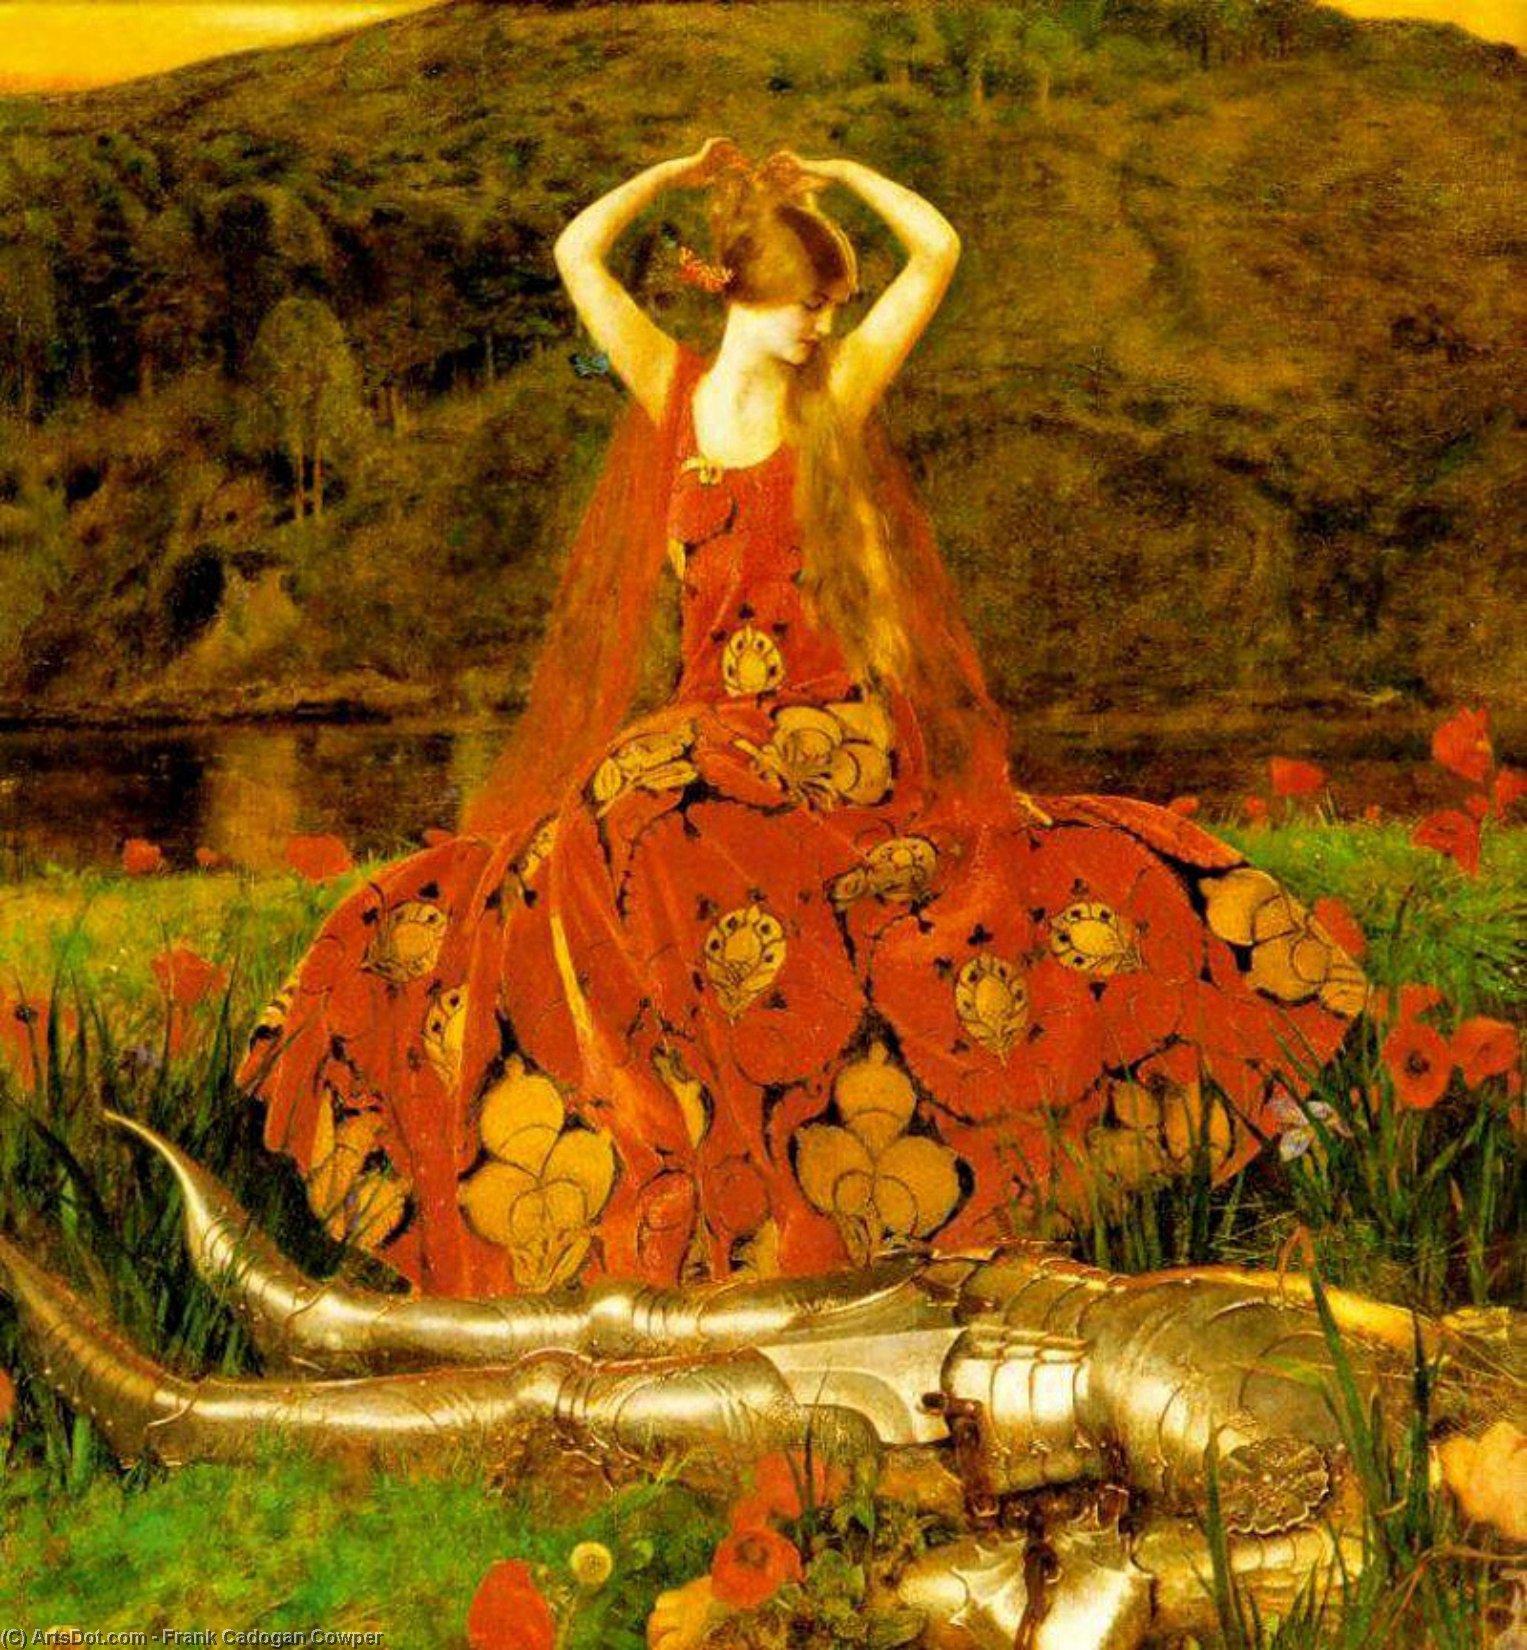 an interpretation of the poem la bell dame sans merci by john keats